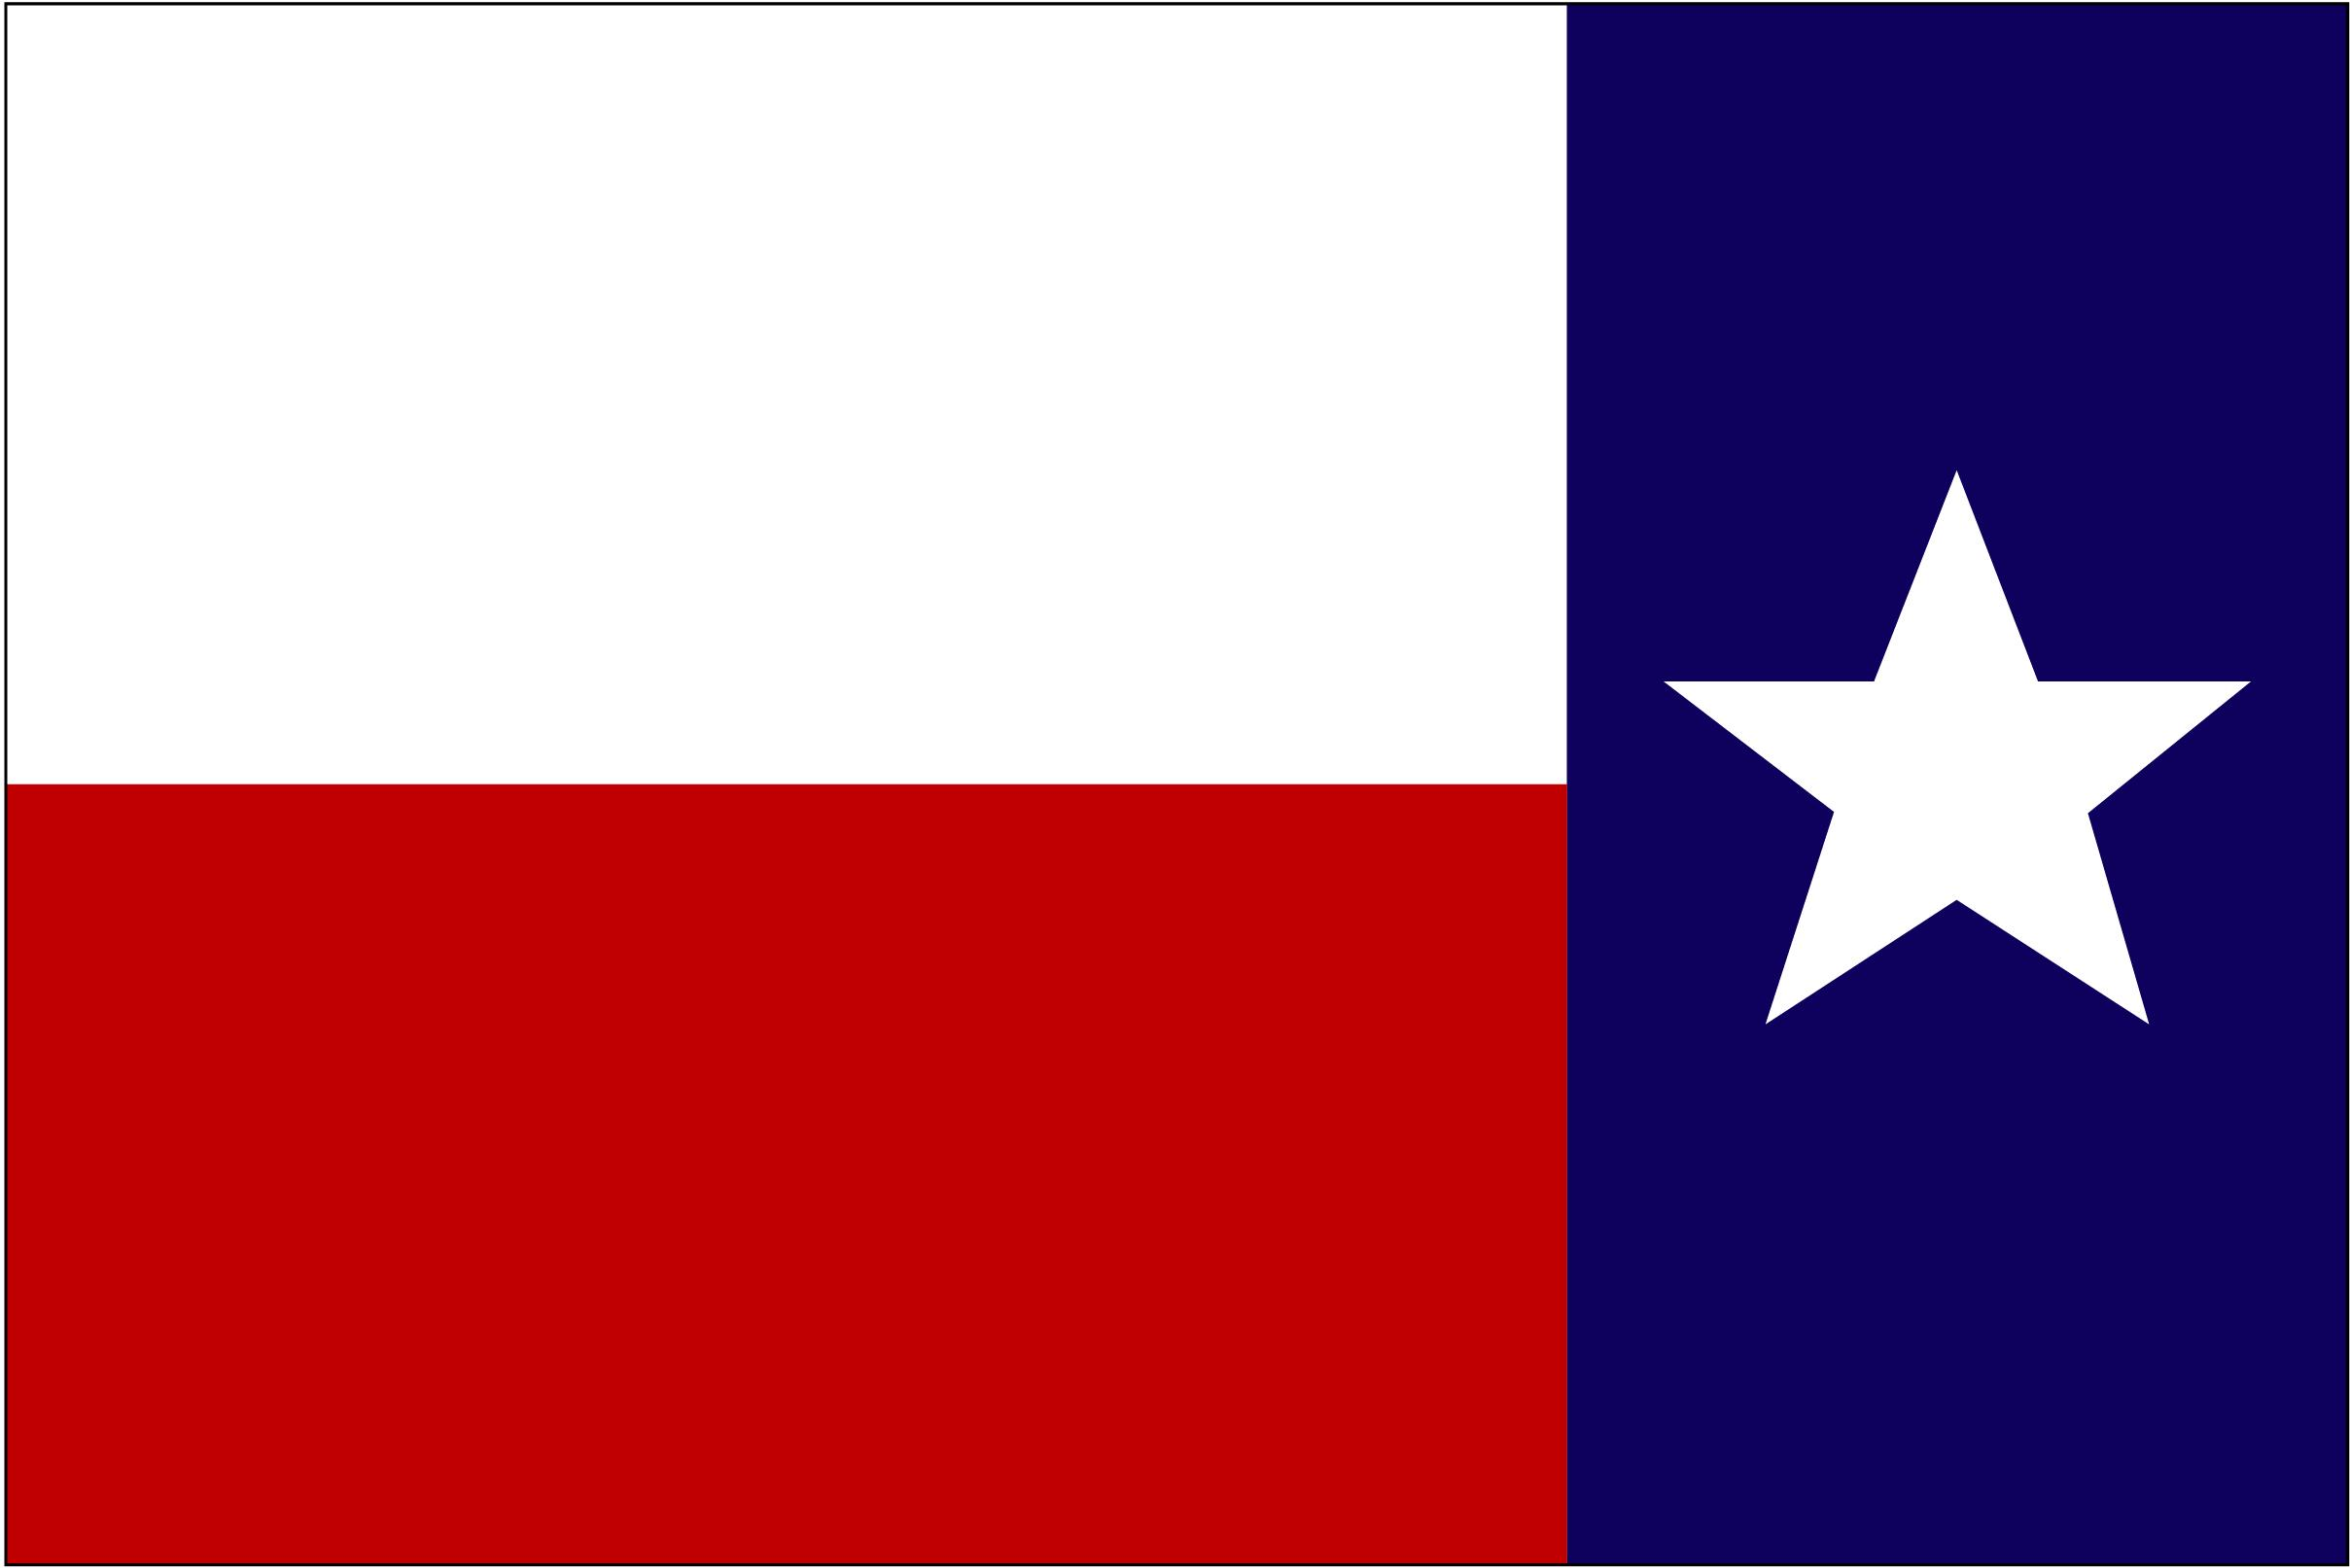 2417x1613 Unique Texas Flag Vector Format Image Free Vector Art, Images